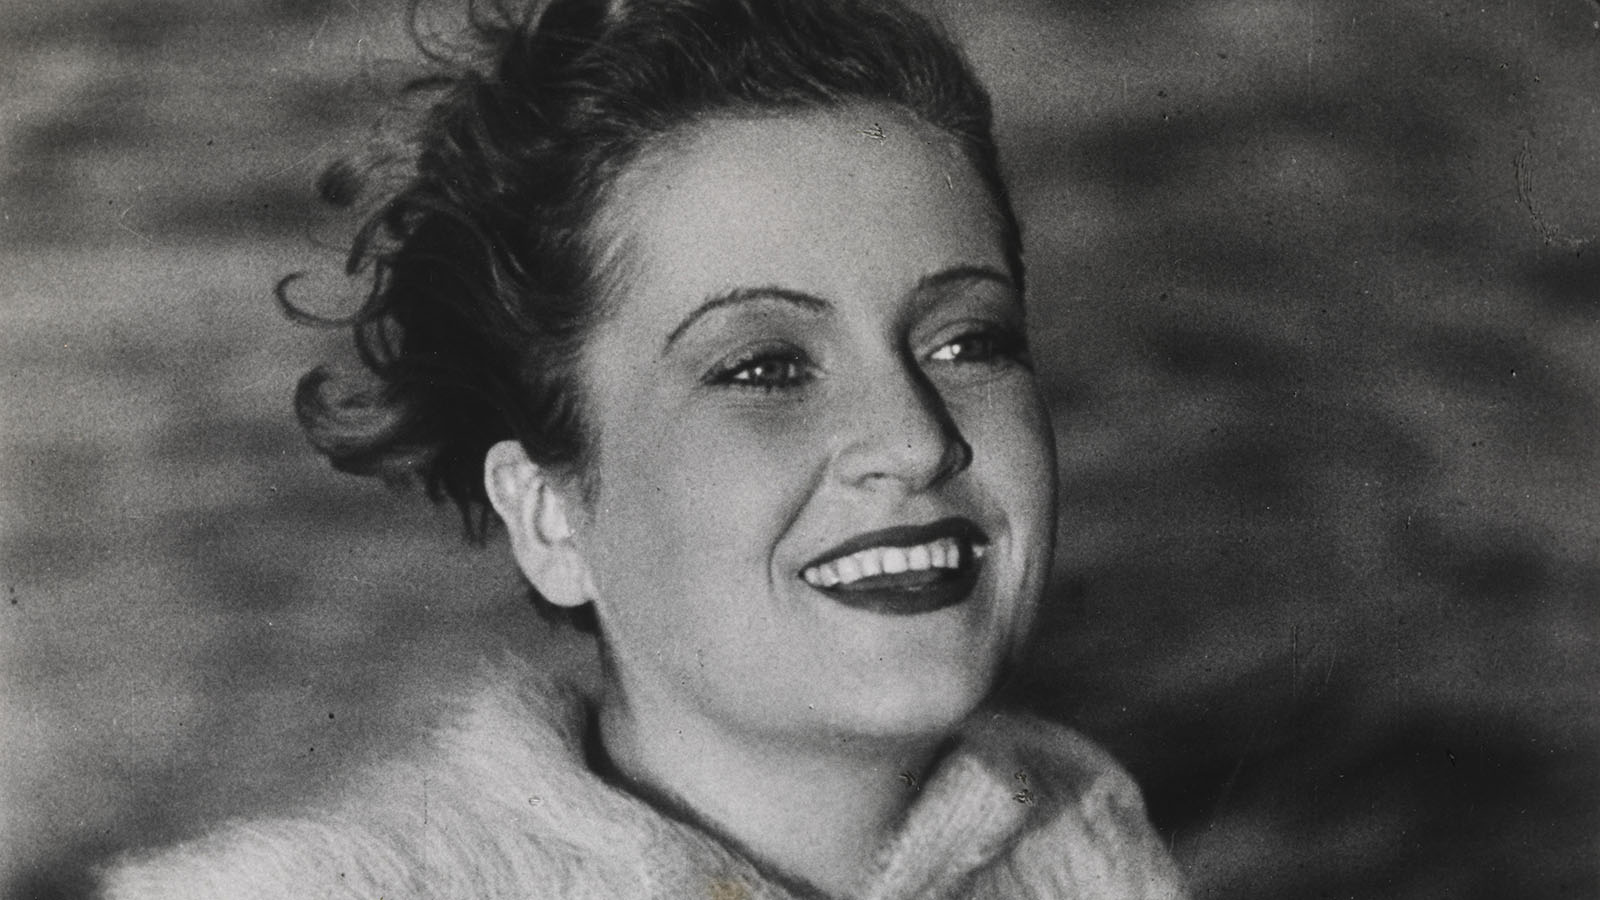 Hva skjedde med Ellinor – Knut Hamsuns datter?